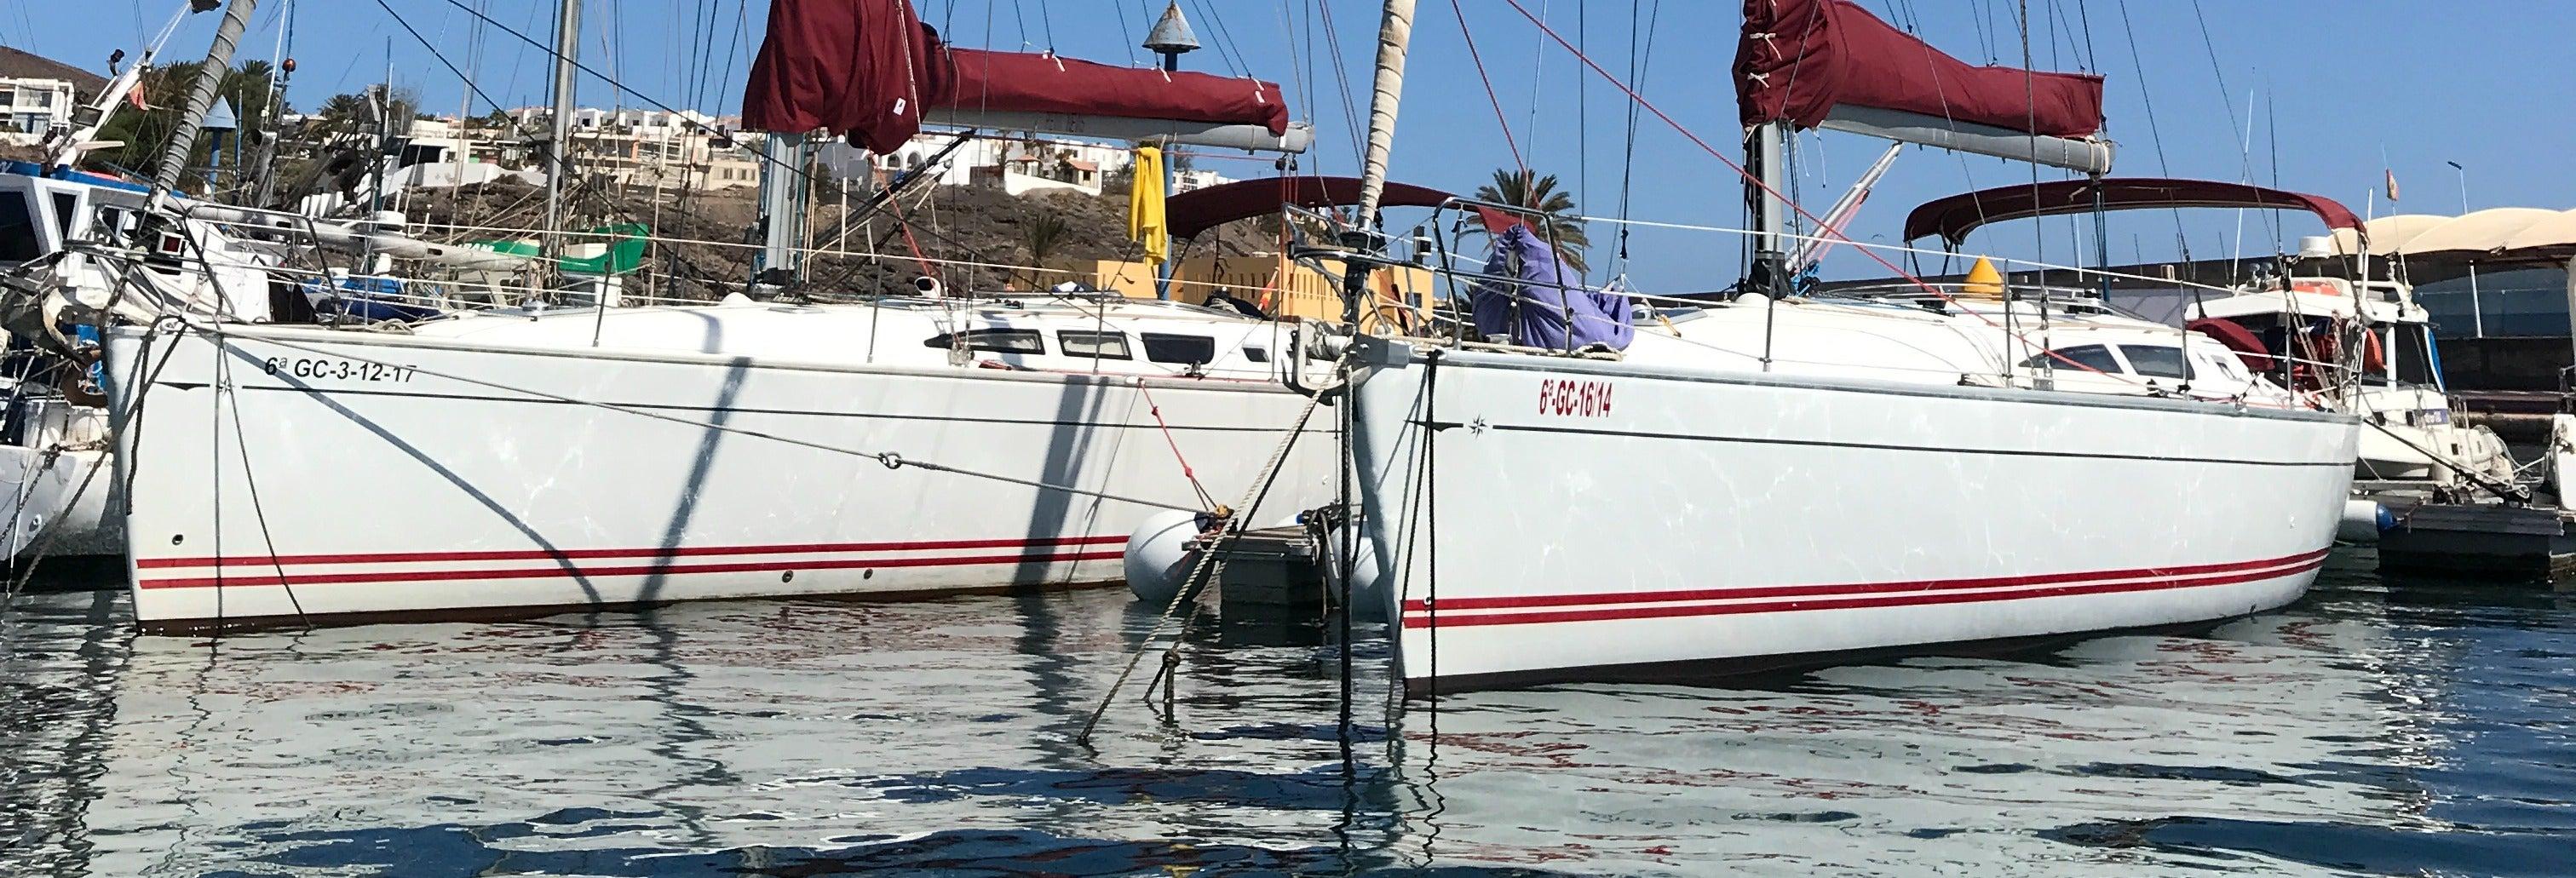 Paseo en velero privado desde Morro Jable